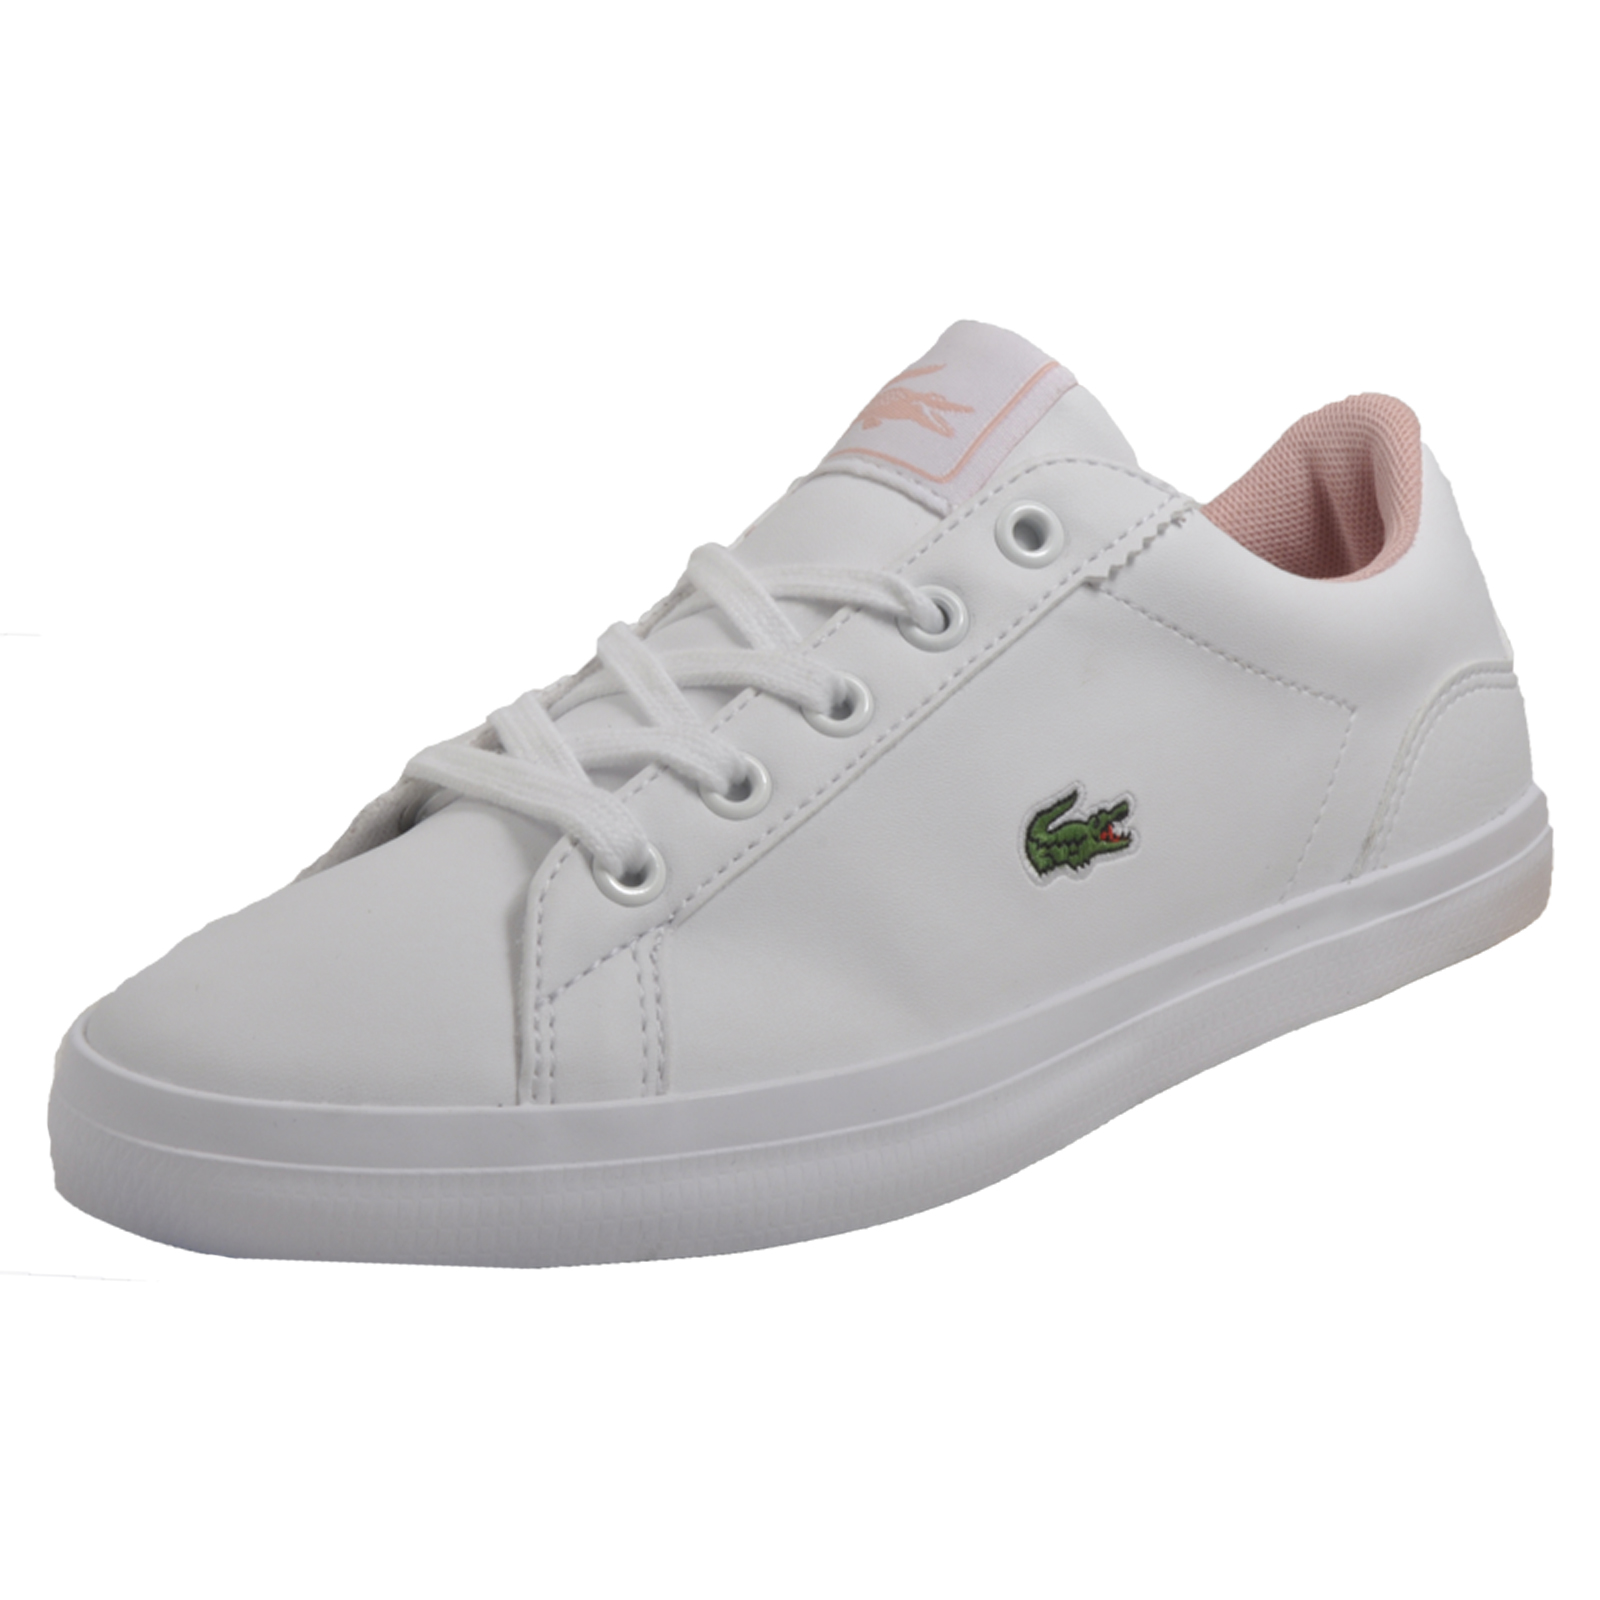 f86a4b5d1 Details about Lacoste Lerond S116 Junior Girls Classic Designer Pumps Flats Trainers  White